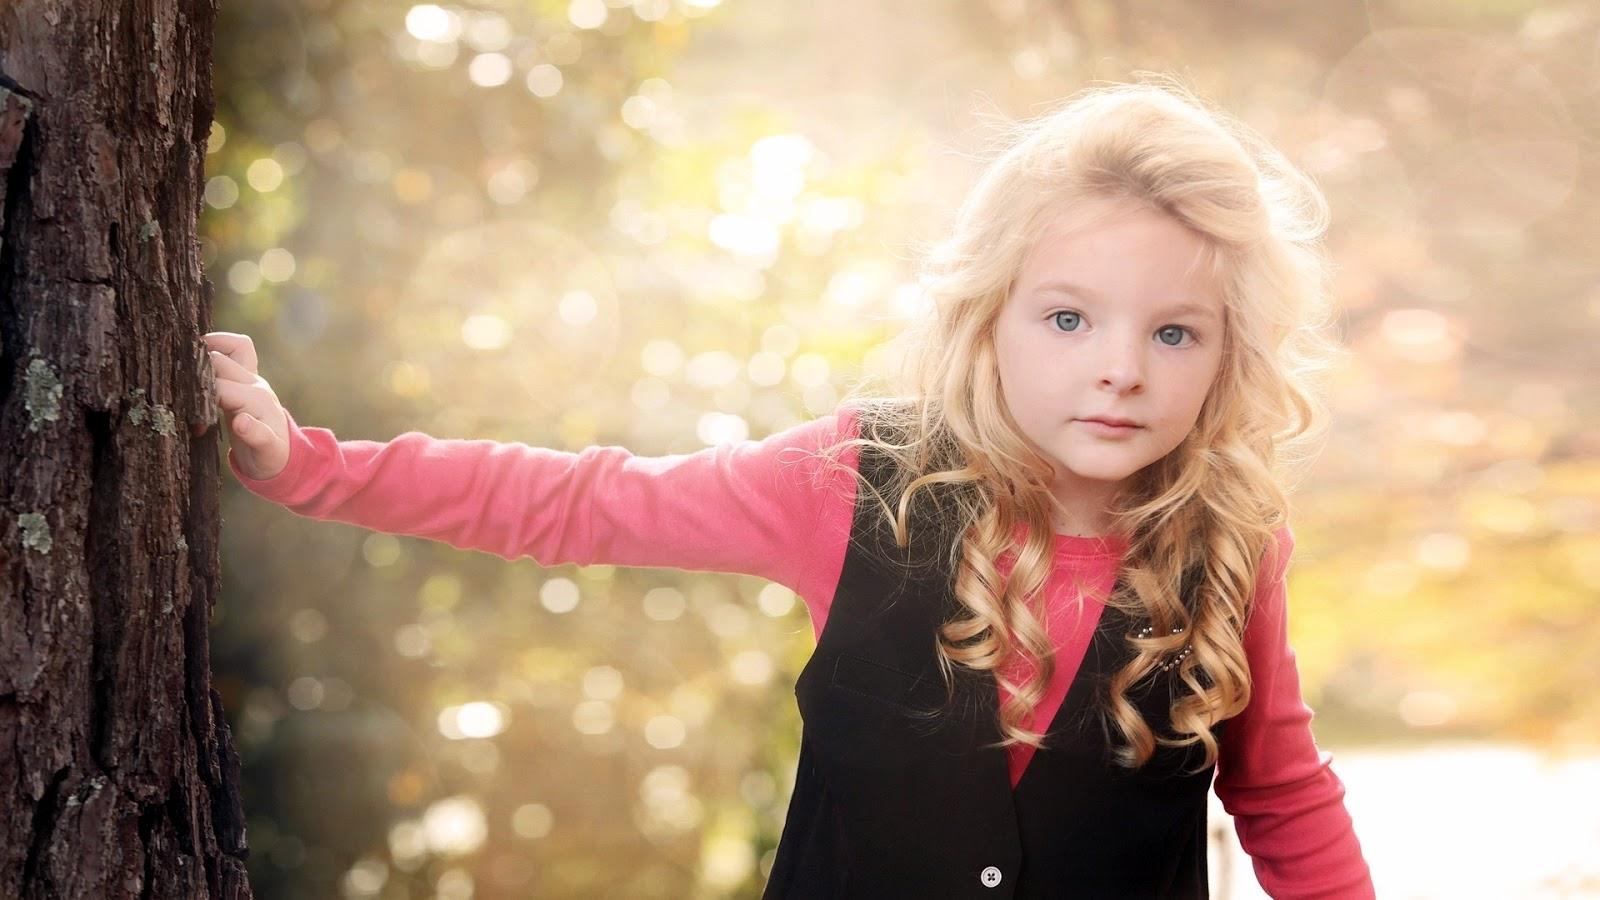 Amazing 4906311 Baby Girl Wallpapers - Hd Cute Little Girl , HD Wallpaper & Backgrounds